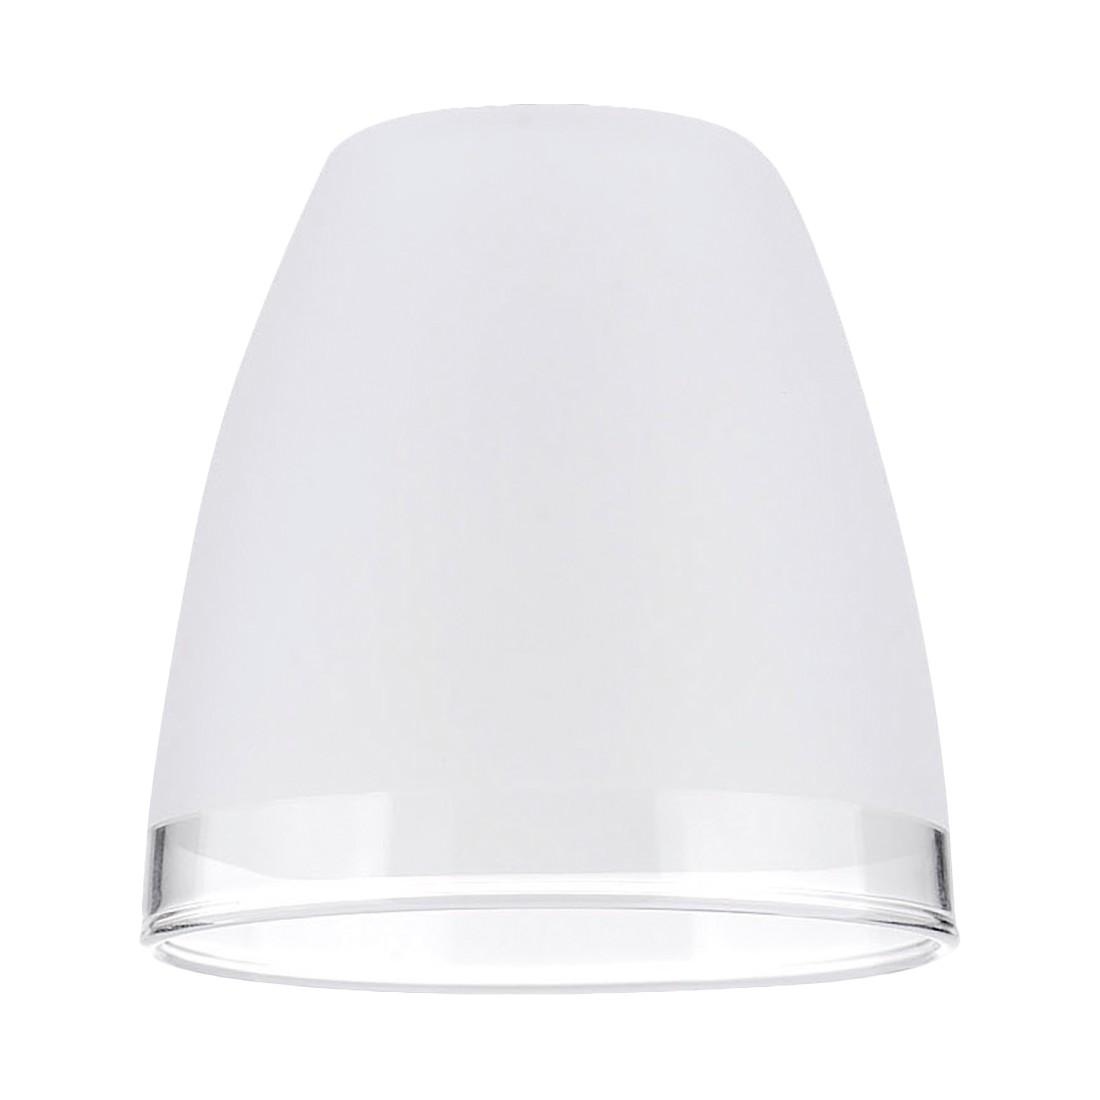 Glasschirm M6 Licht / Spot16, Fischer Leuchten bestellen